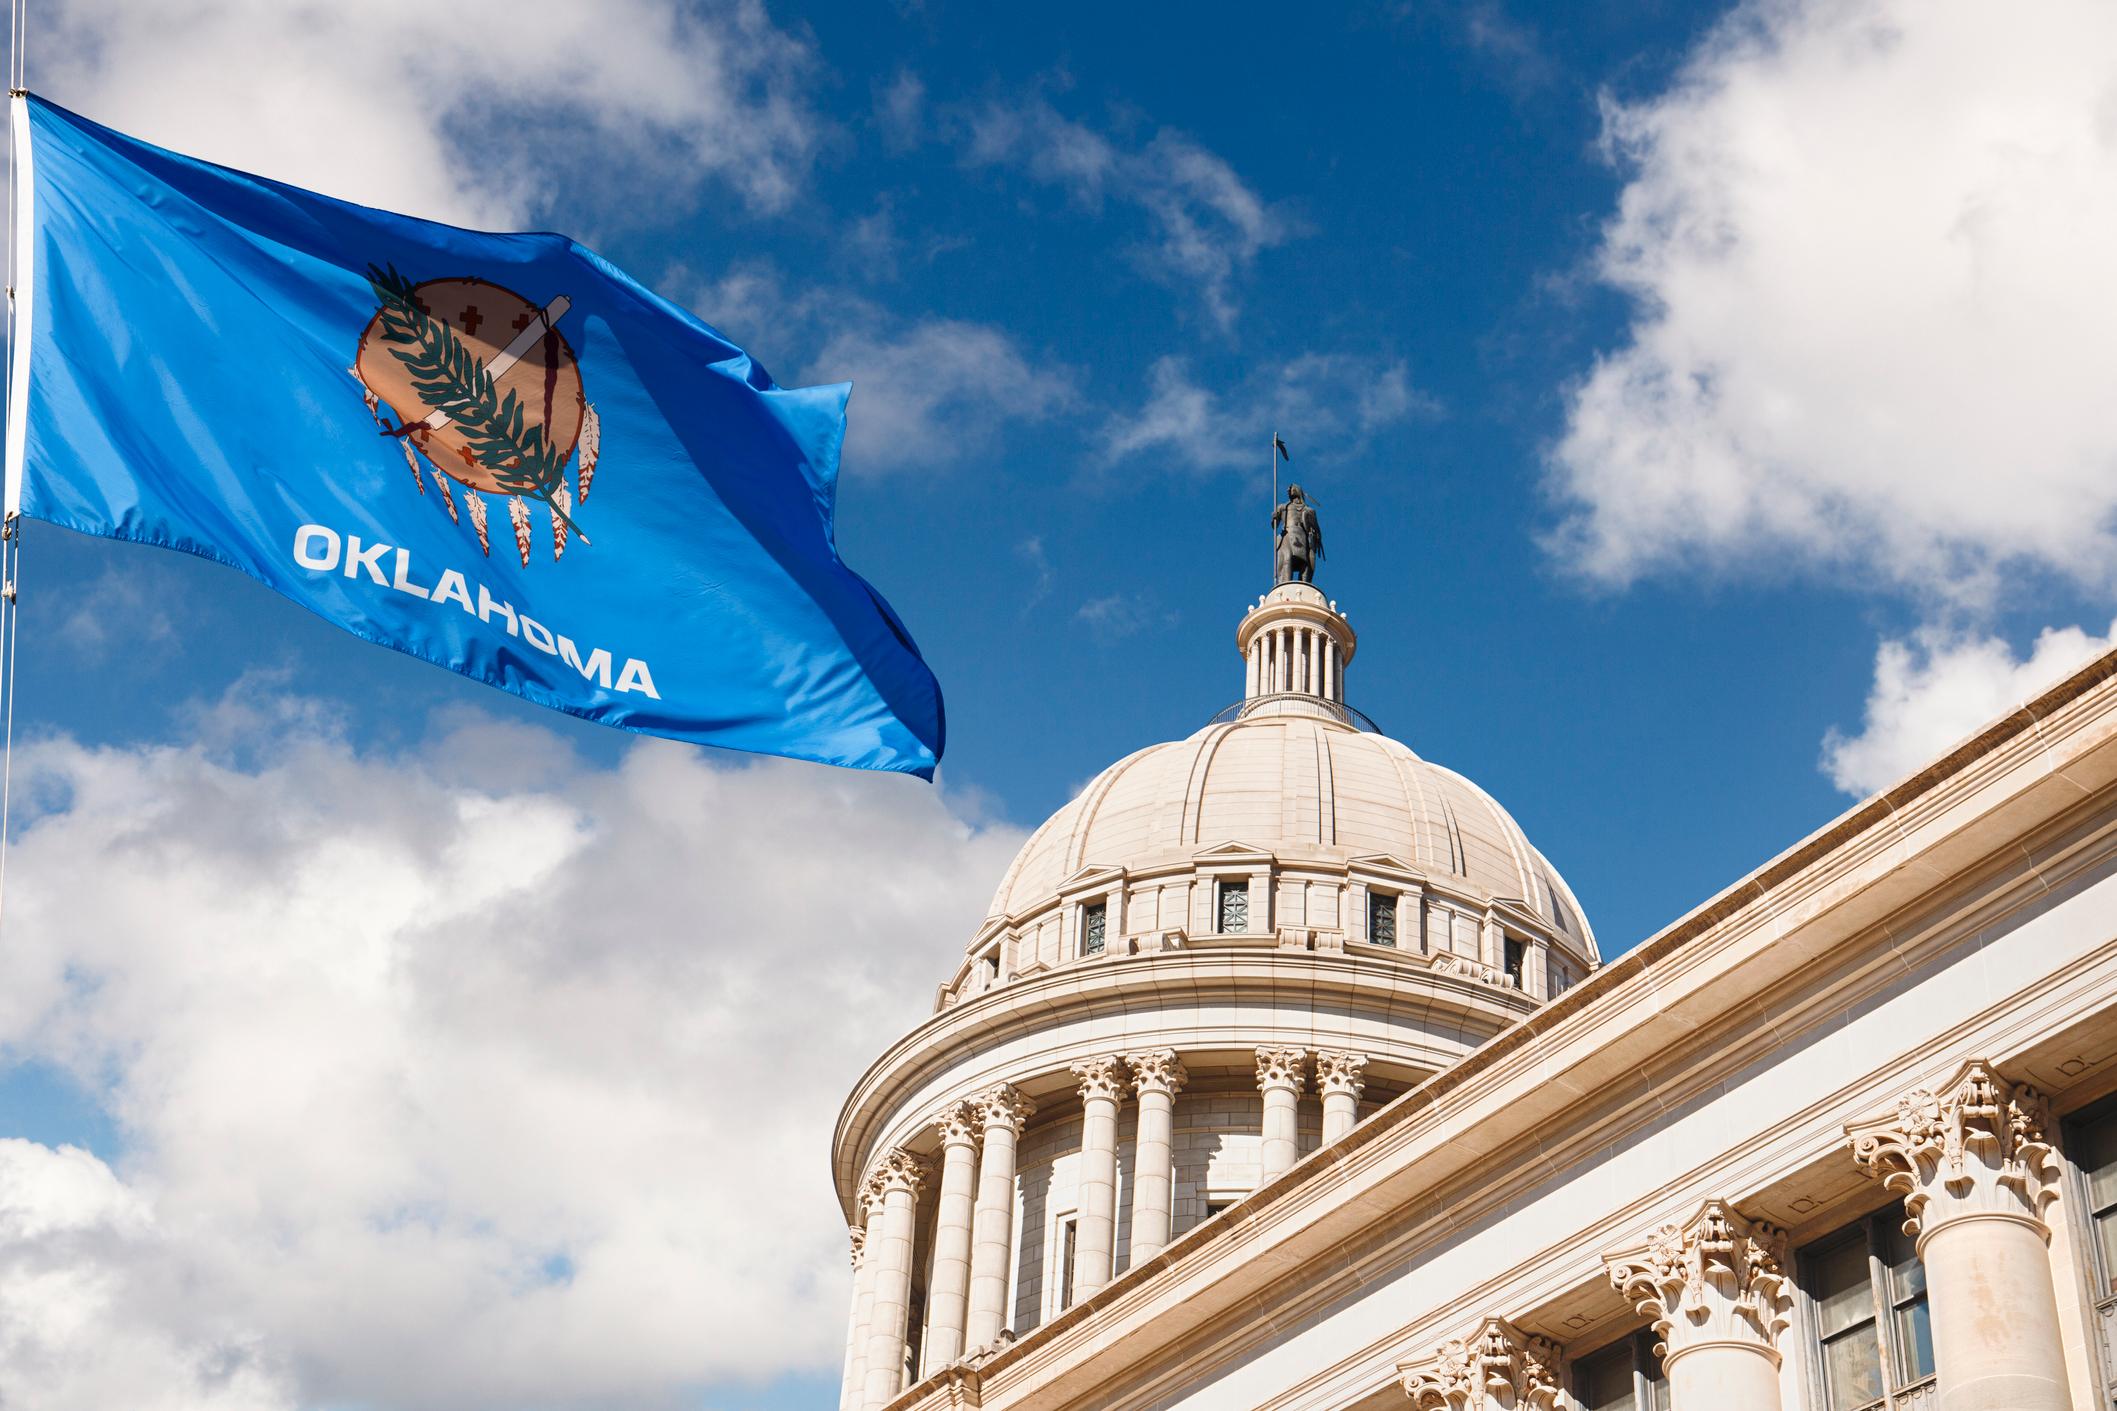 Johnson & Johnson used a 'deceitful, multibillion-dollar brainwashing campaign' to market painkillers, Oklahoma says